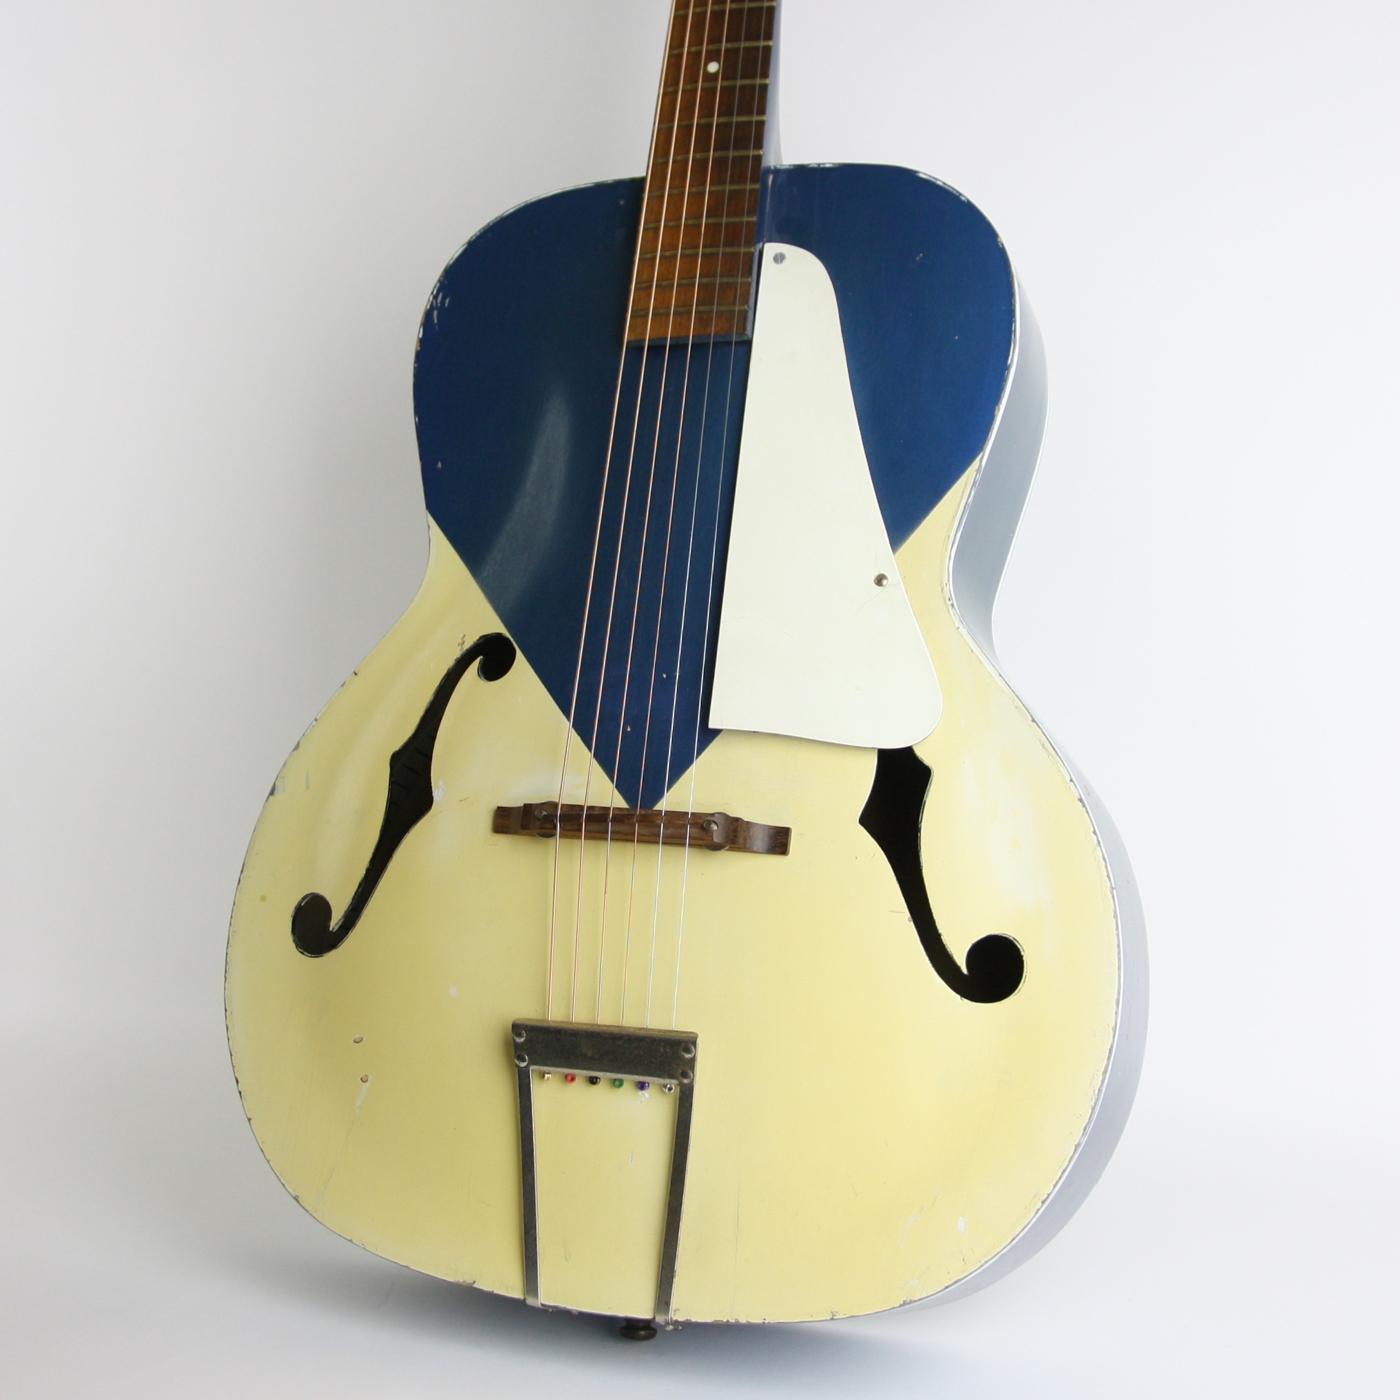 Silvertone Colorama Kentucky Blue - Thunder Road Guitars Seattle